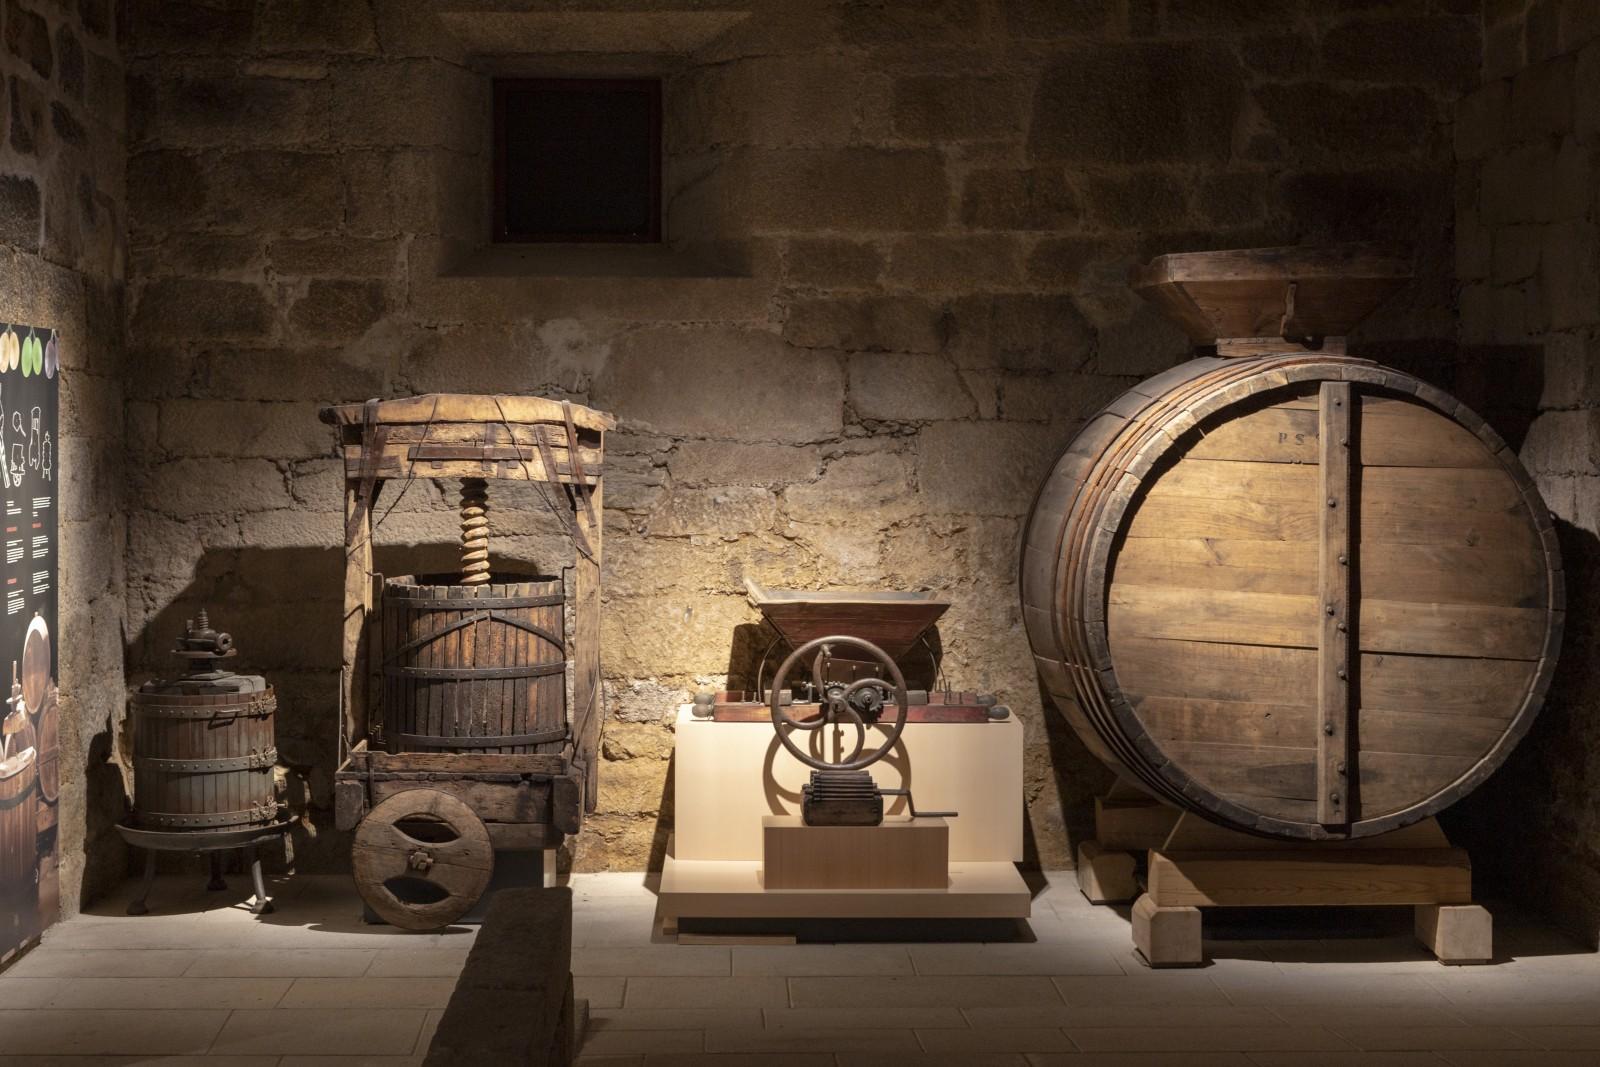 Sala 7 del Museo del Vino